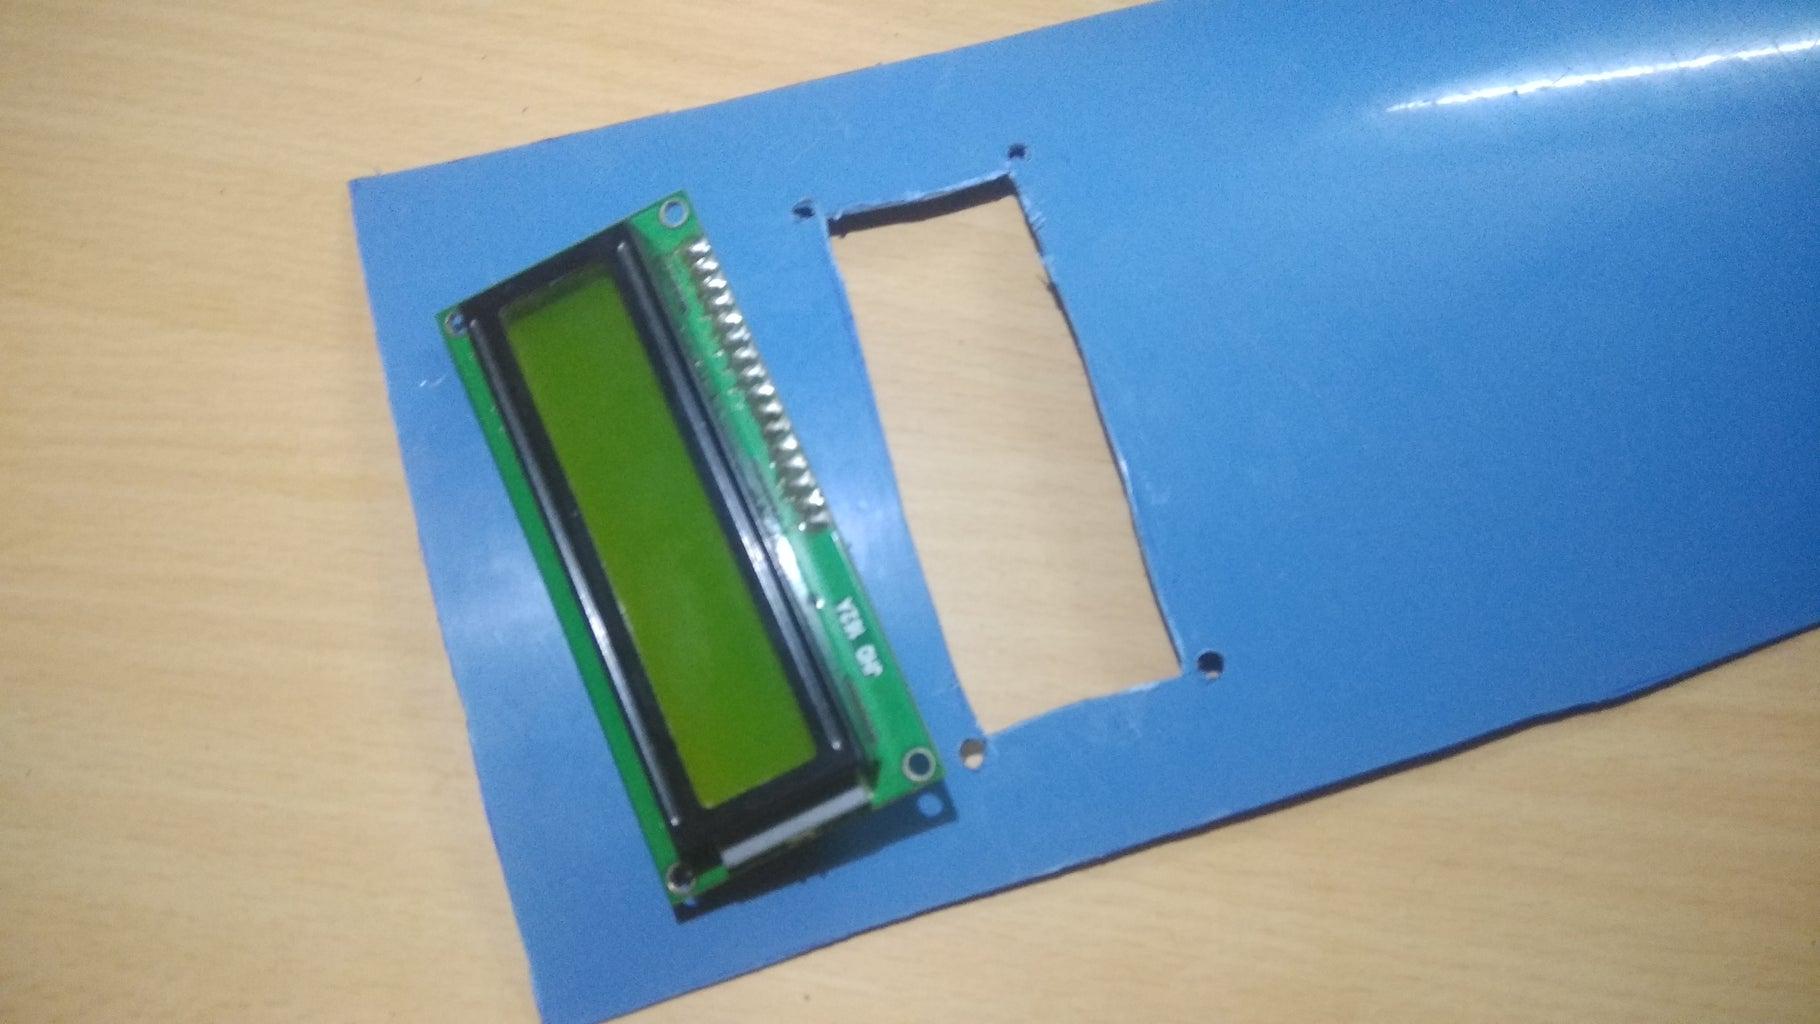 PREPARING THE LCD DISPLAY